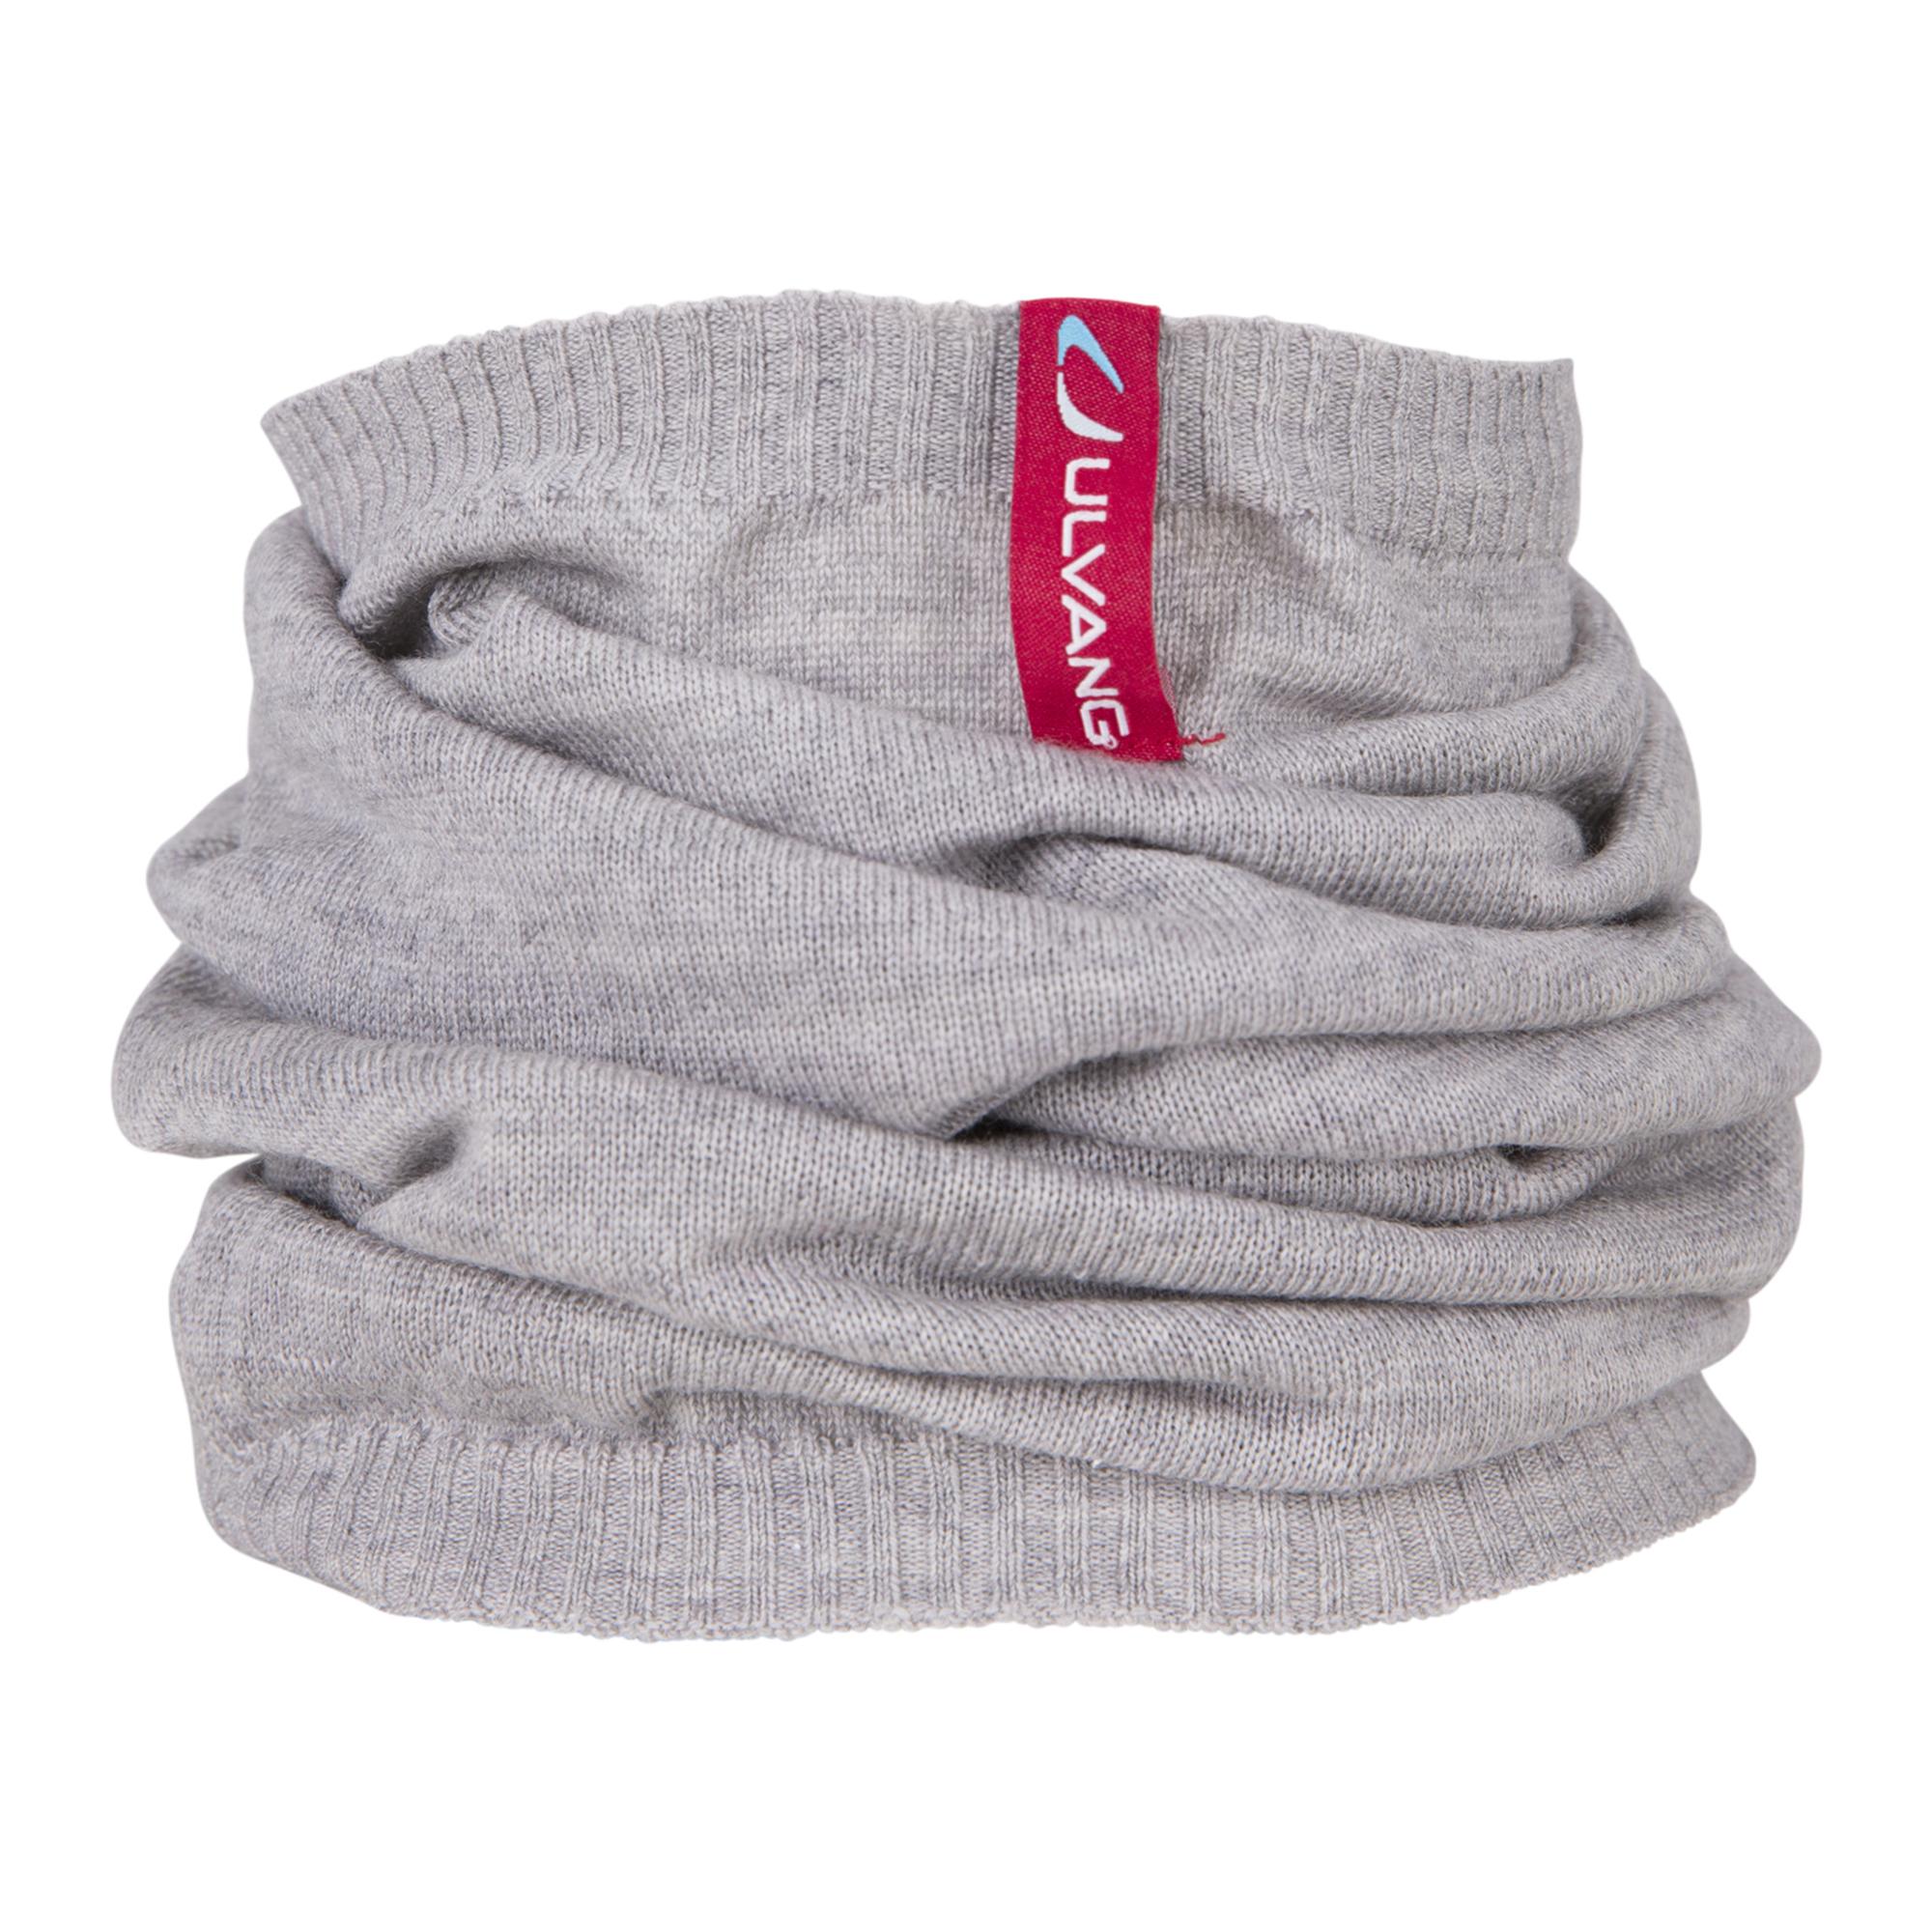 Ulvang Rim Headover - Uld halsedisse - Grå - One Size | Headwear